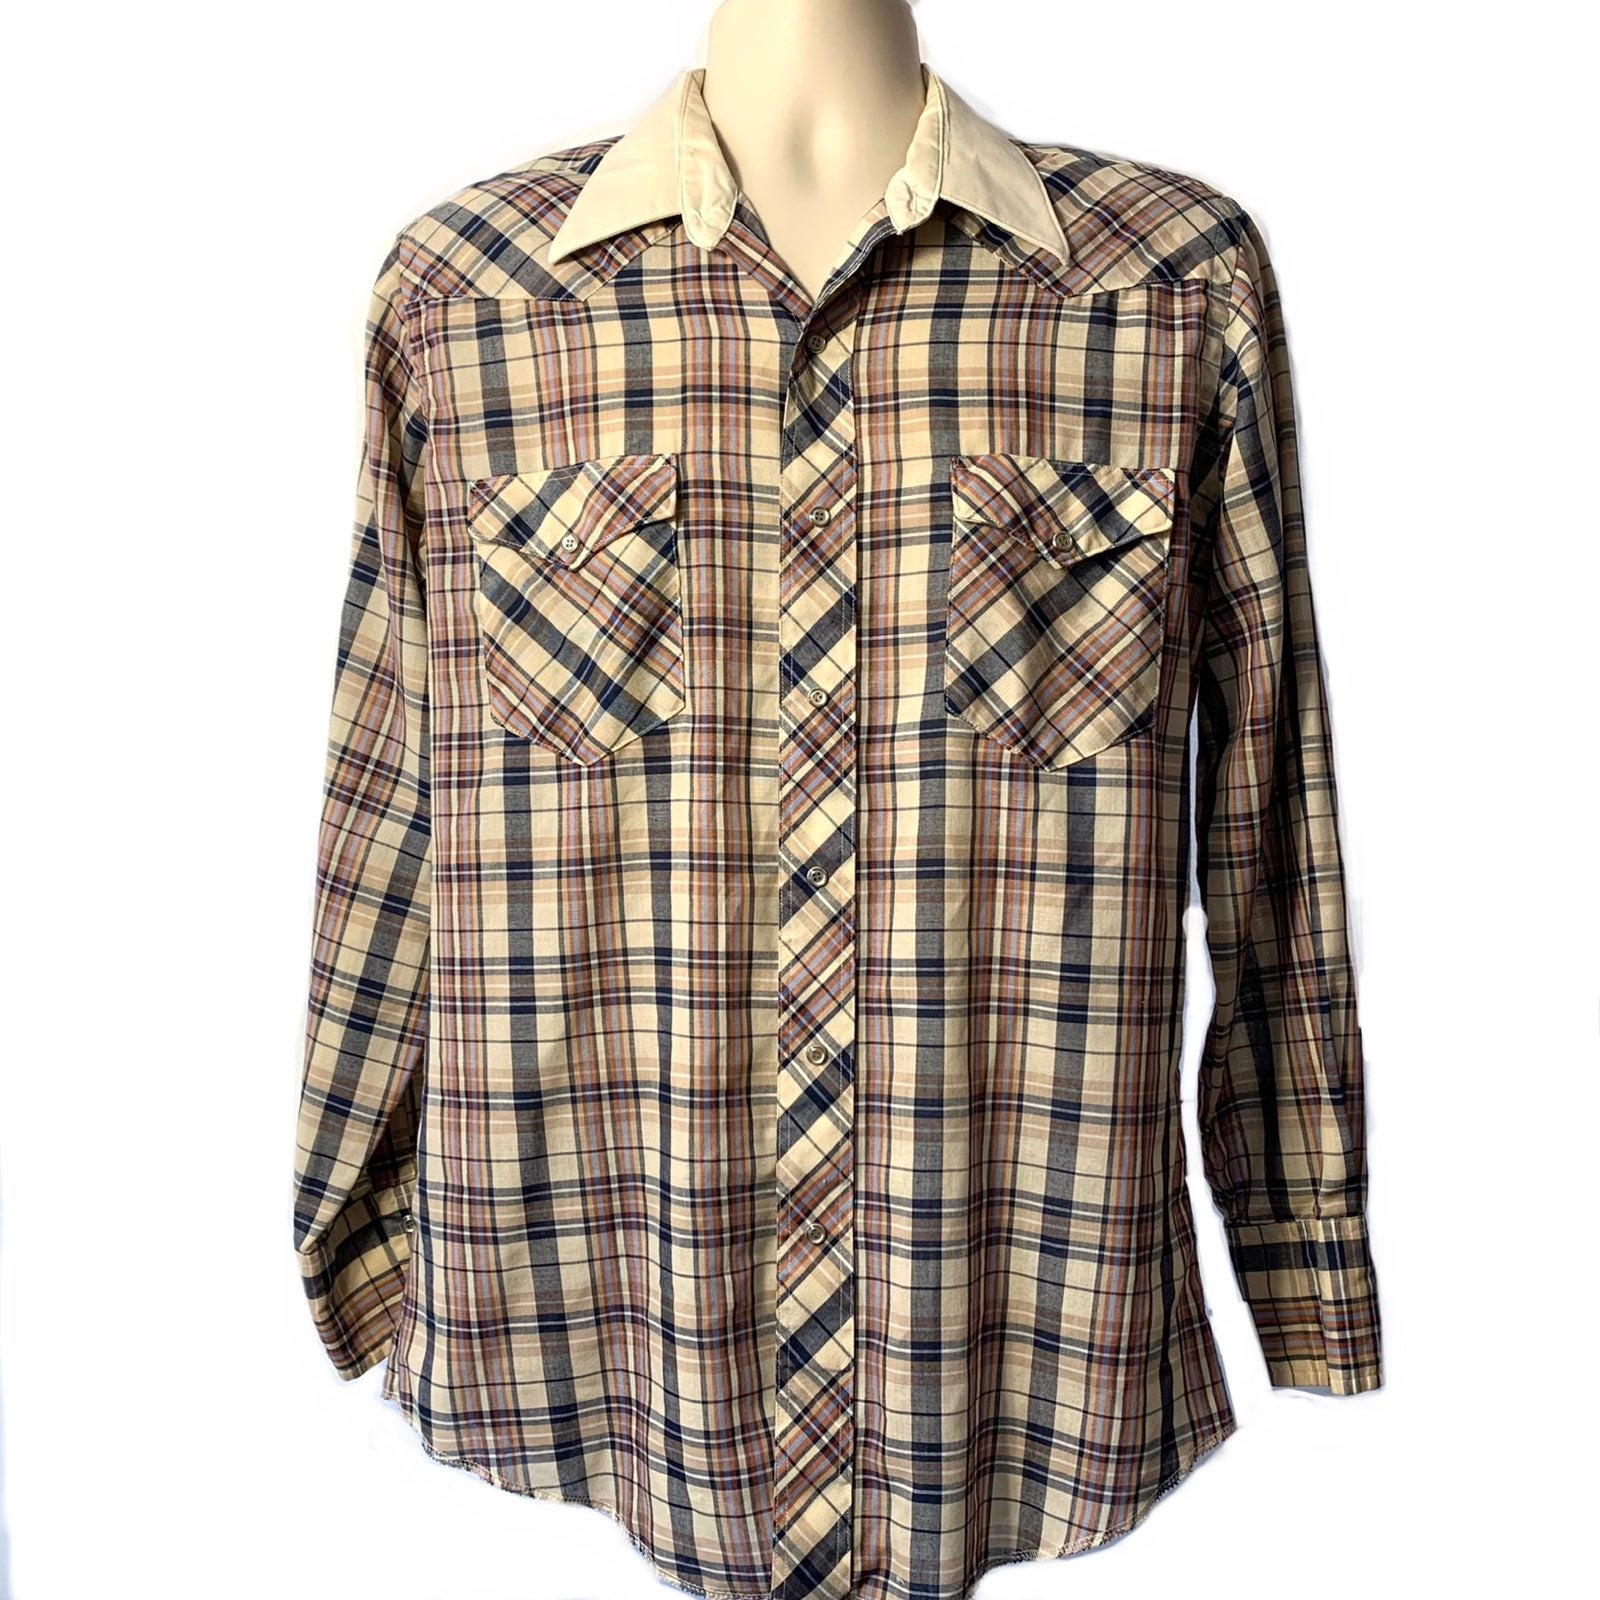 Vintage Wrangler Mens Western Shirt 70s